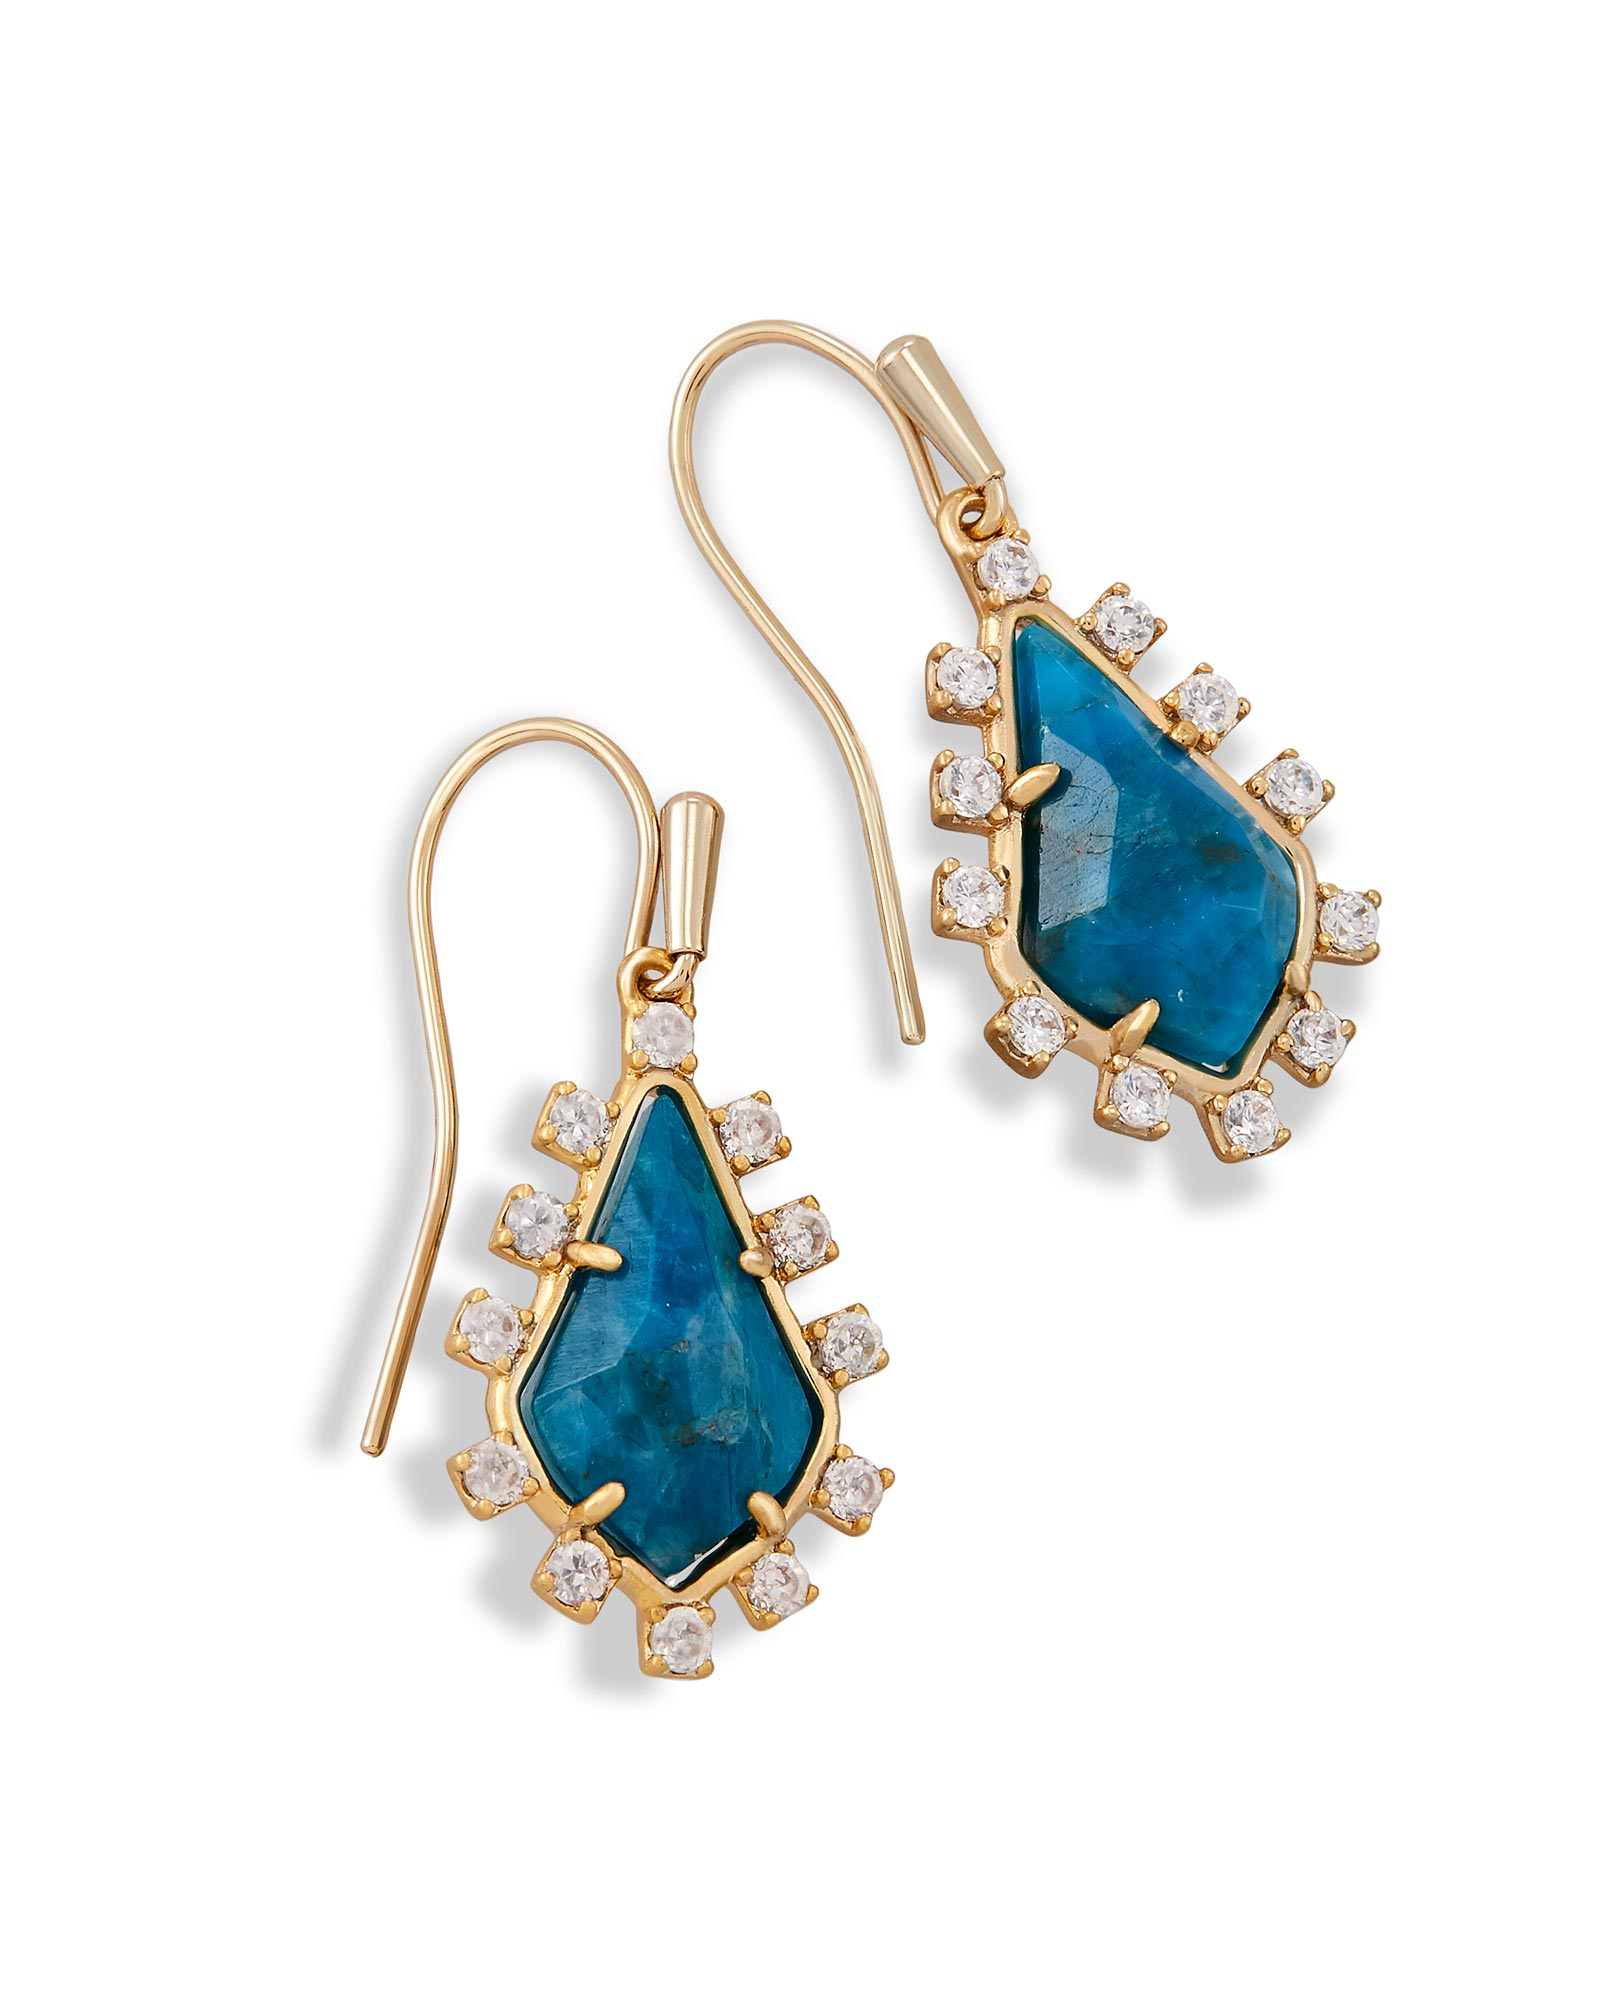 Juniper Drop Earrings in Aqua Apatite